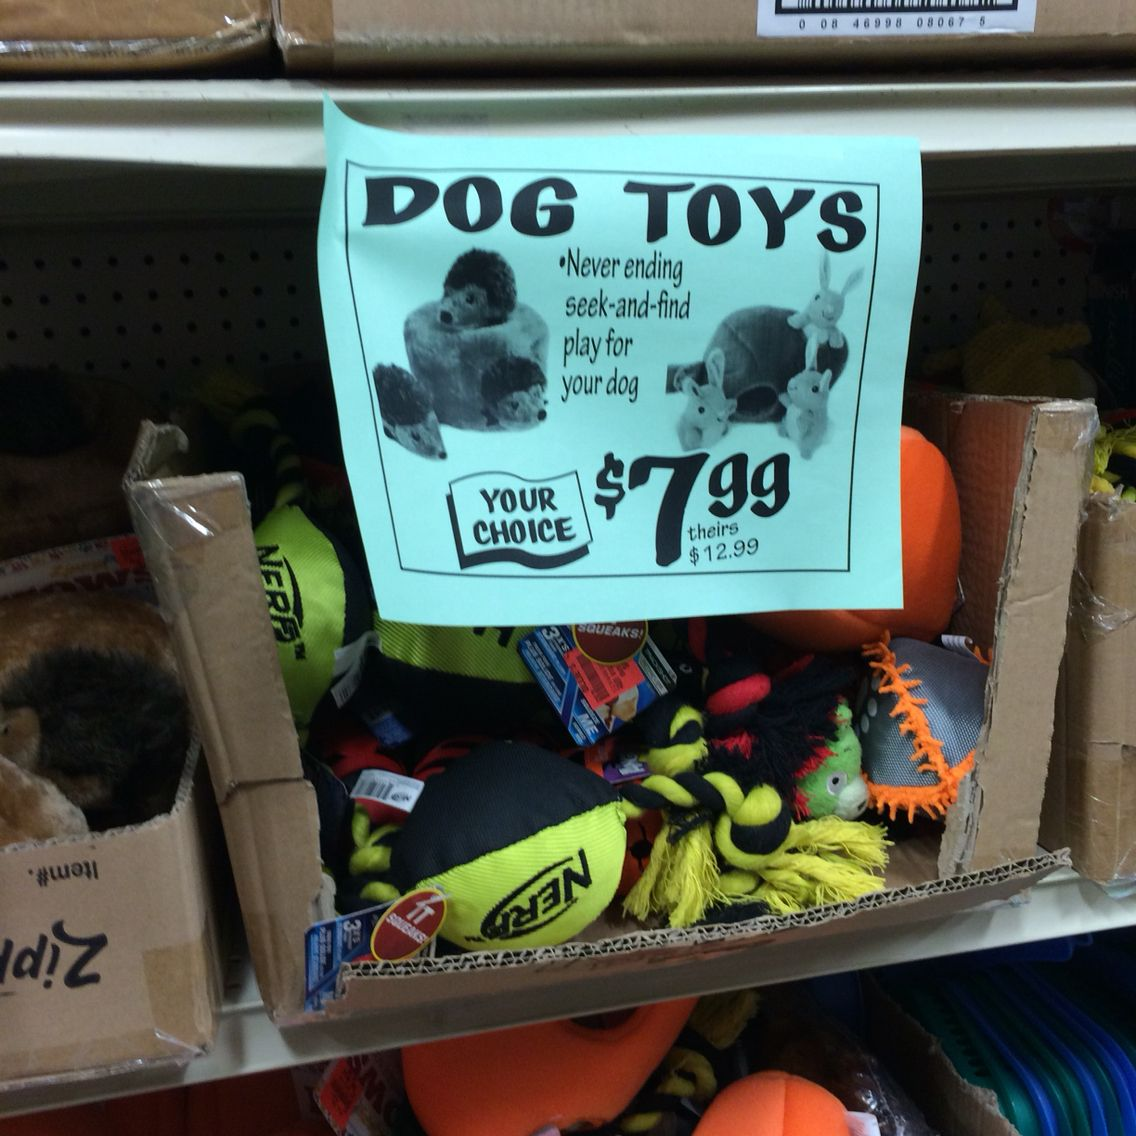 When shopping doggie stuff always grabs my eye!